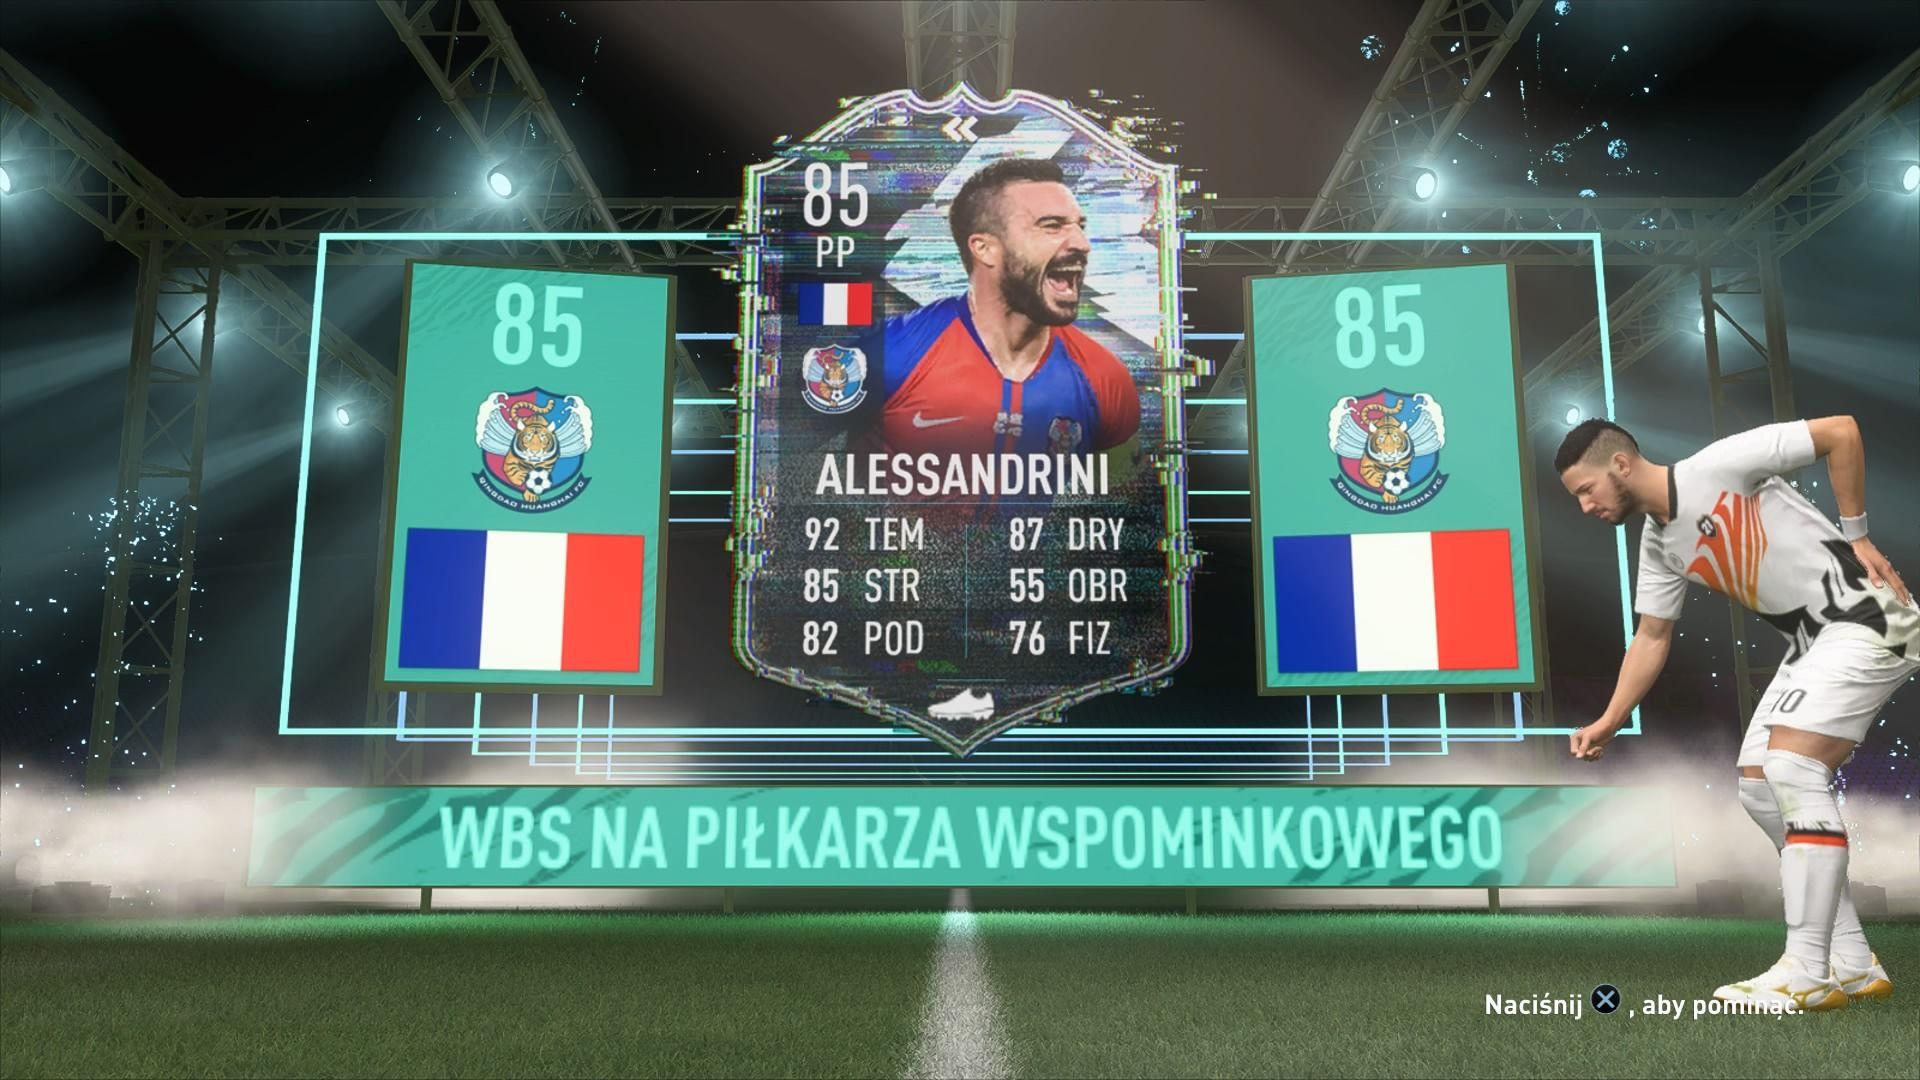 FIFA_21_recenzja_20_